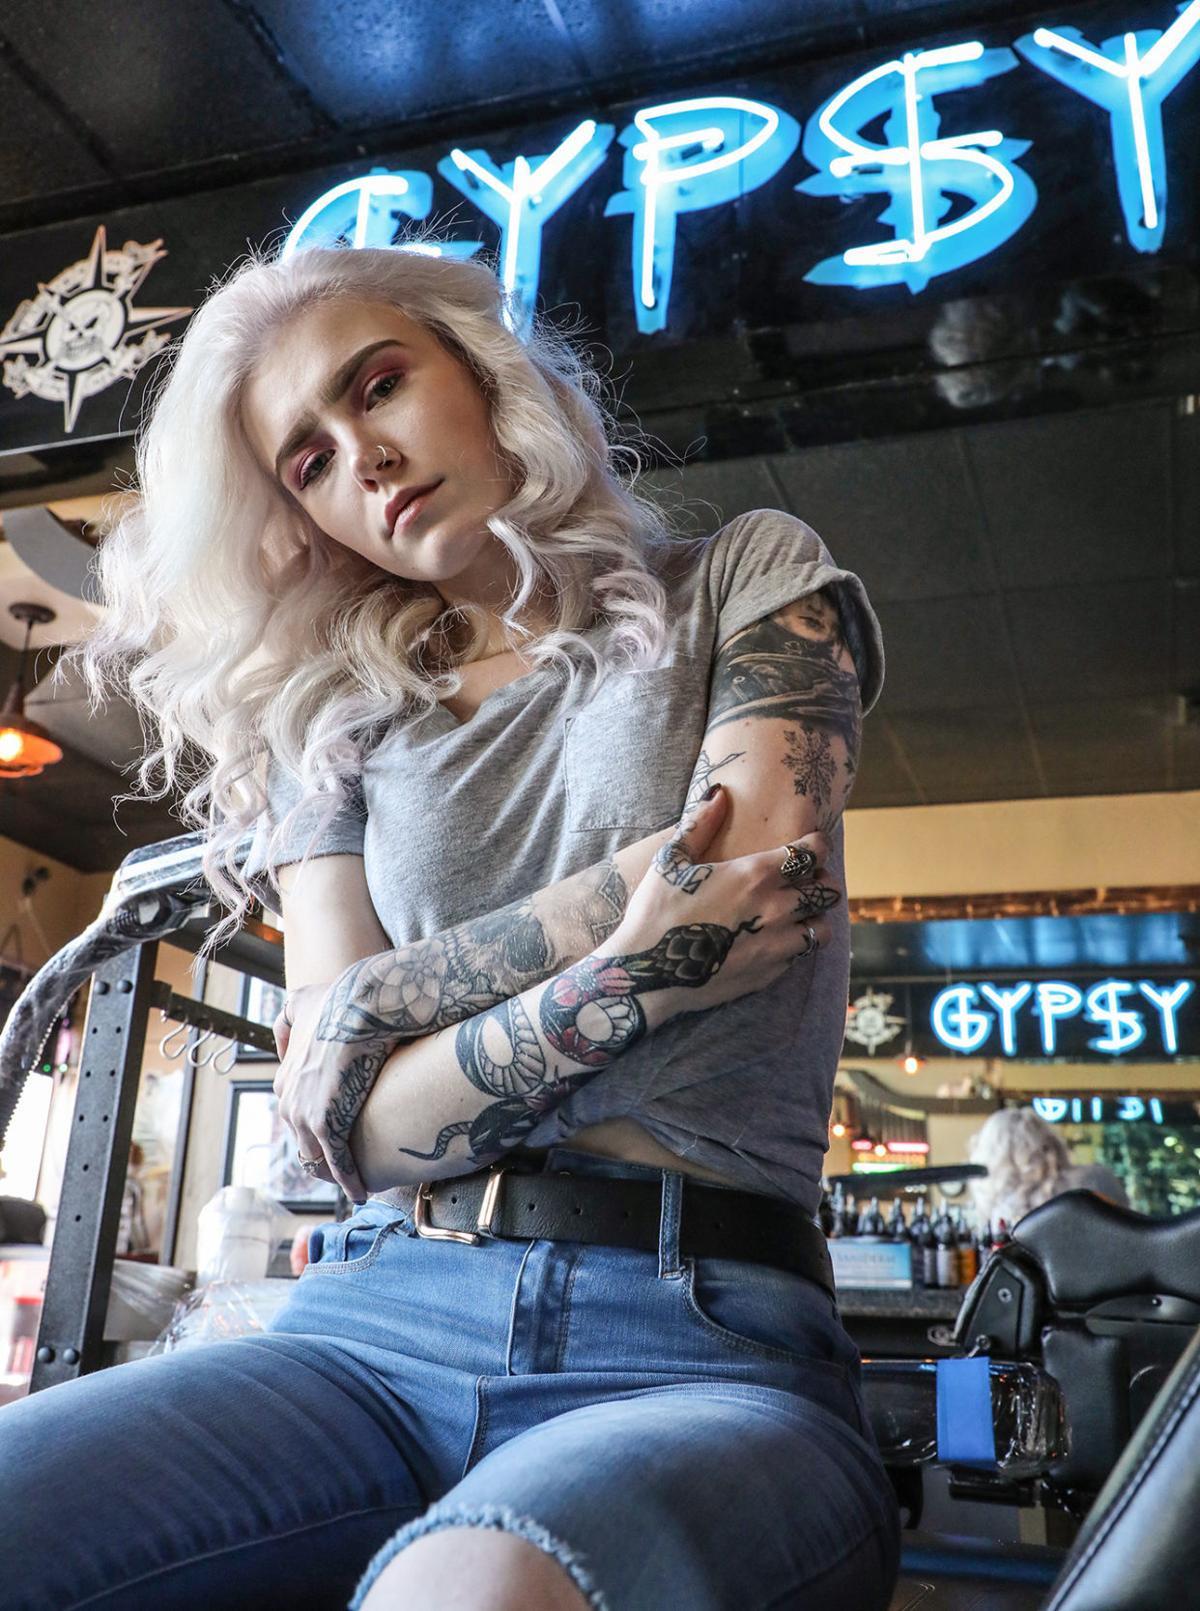 Krysten Bruderer Inked cover girl competition